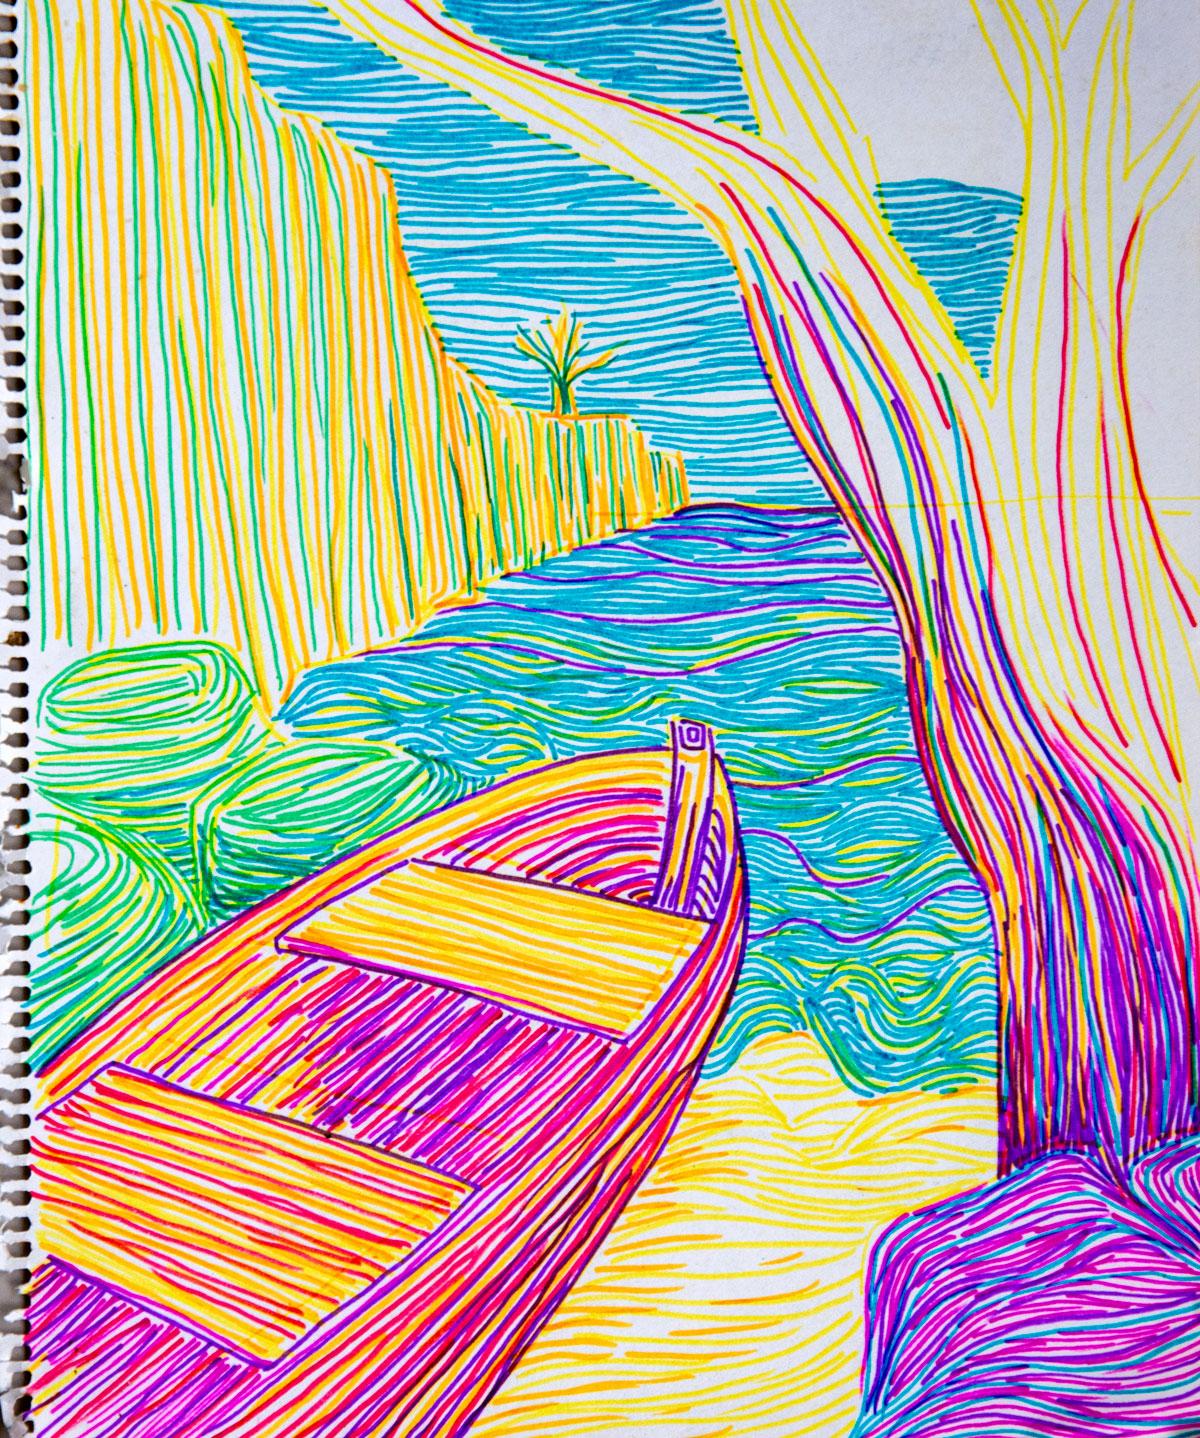 Drawing Lagun Bay in Curacao